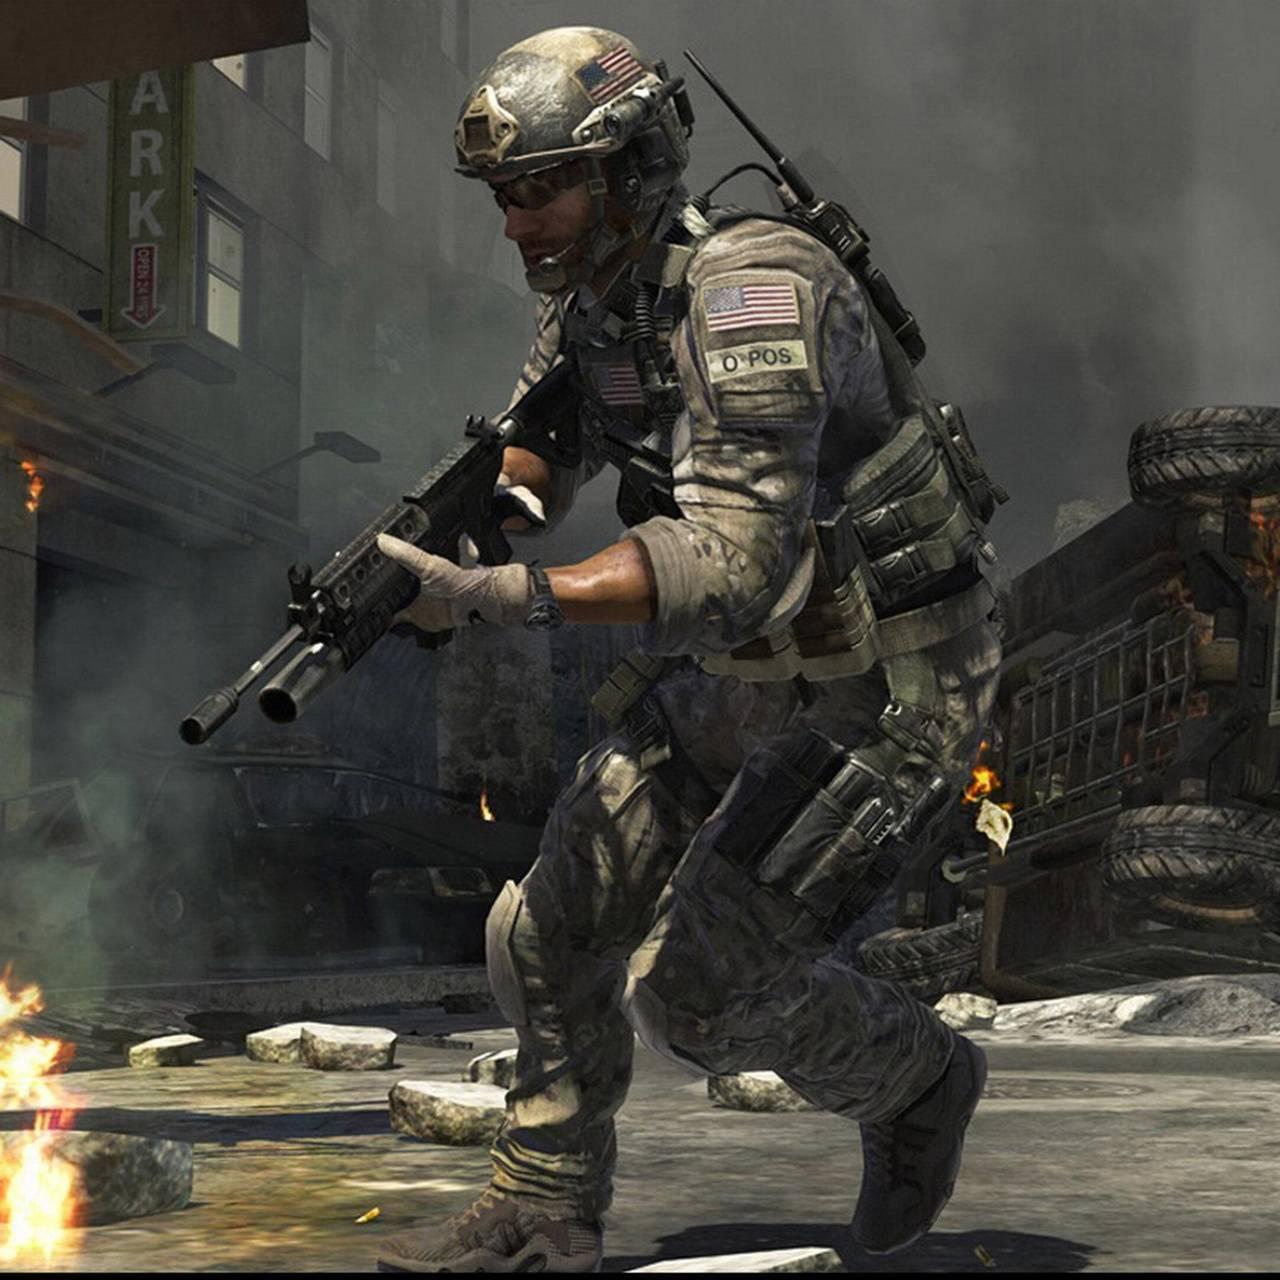 Call Of Duty 4 Wallpaper By Stylish Boy 5f Free On Zedge